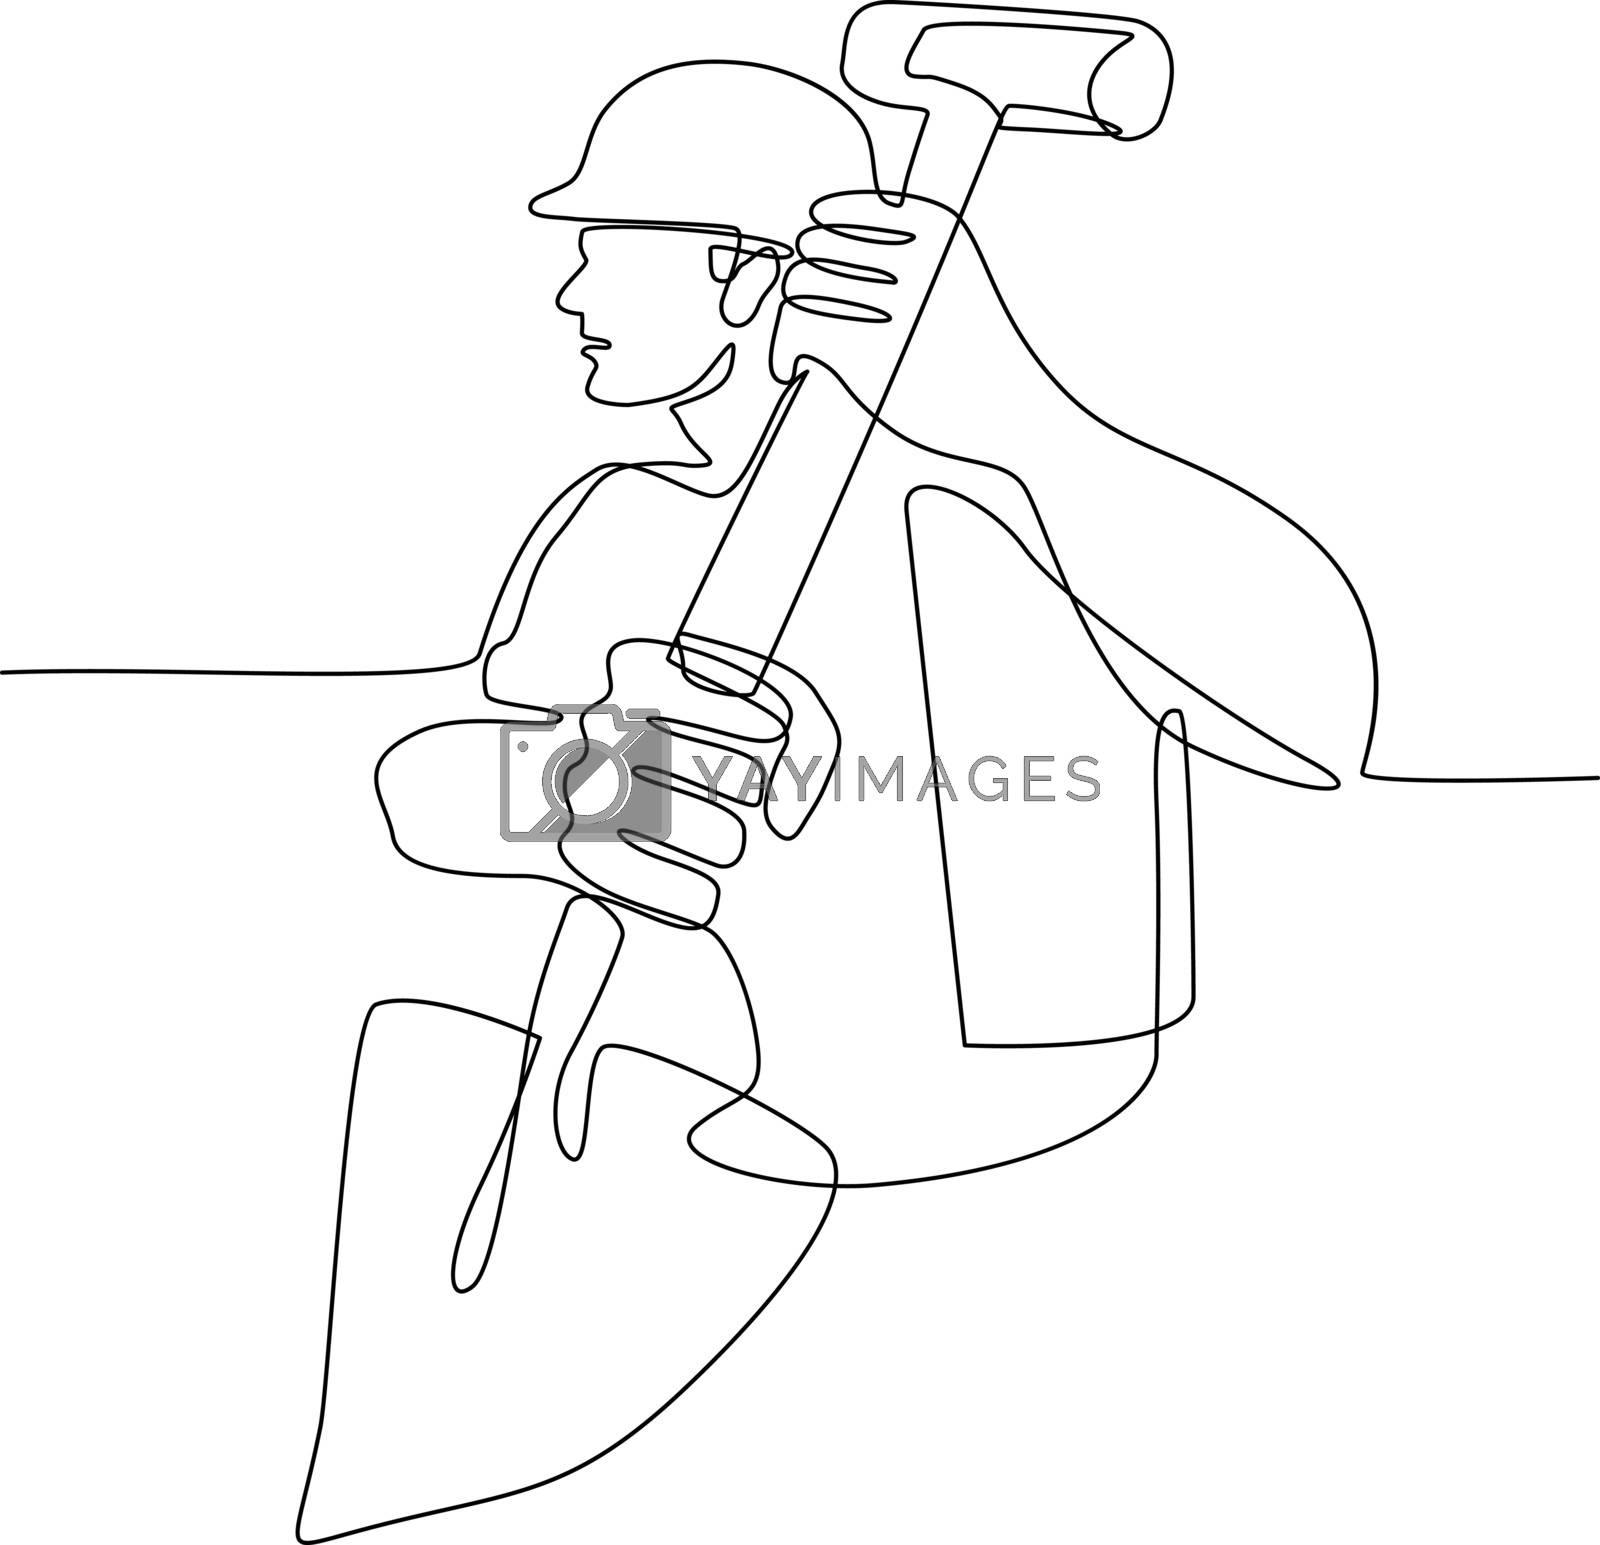 Construction Worker Spade Continuous Line by patrimonio